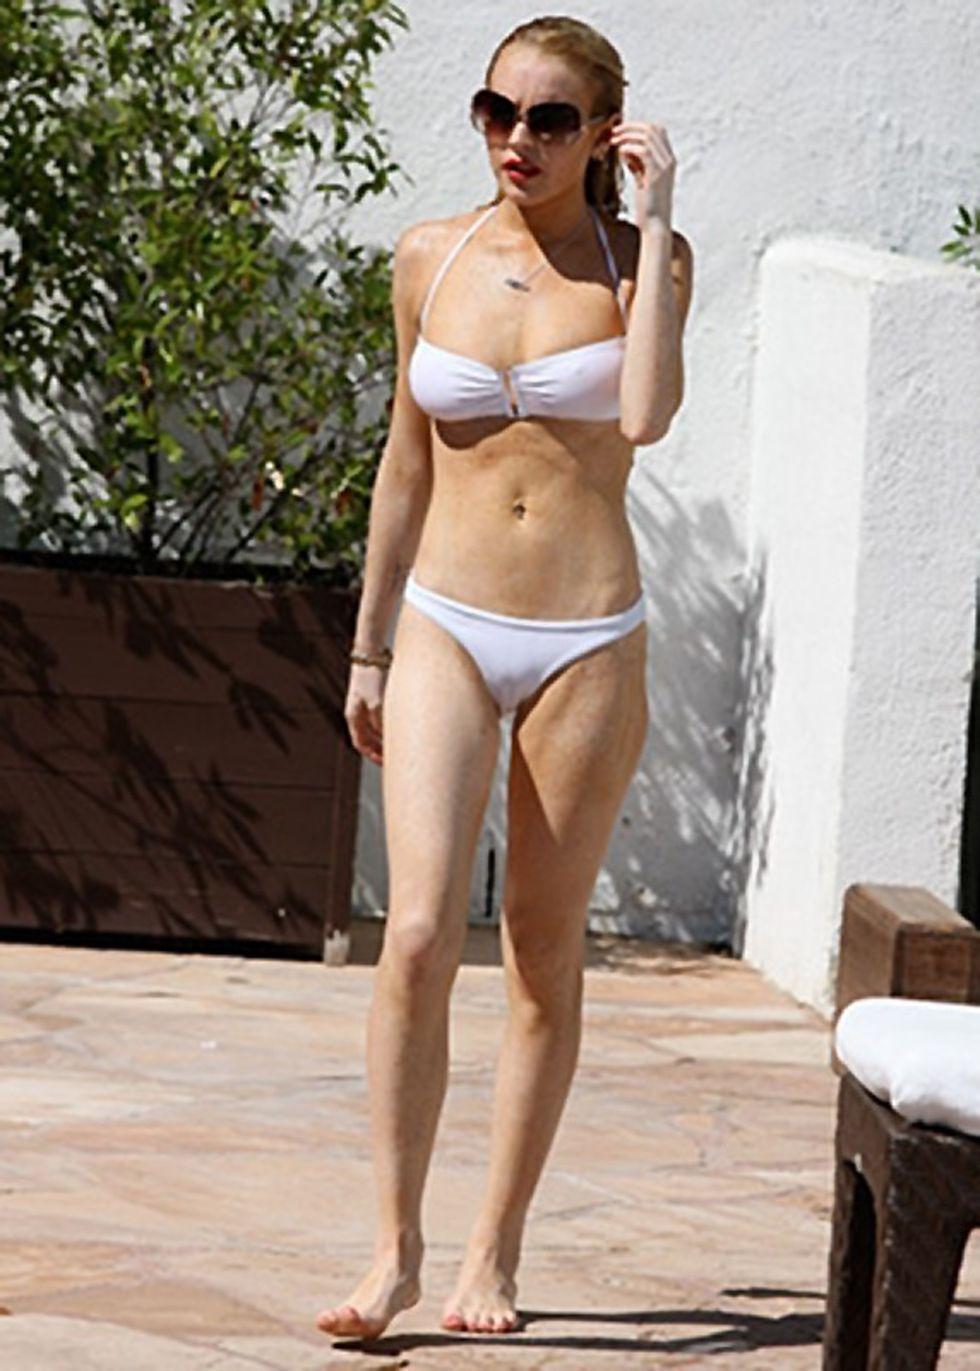 lindsay-lohan-bikini-candids-in-los-angeles-mq-02